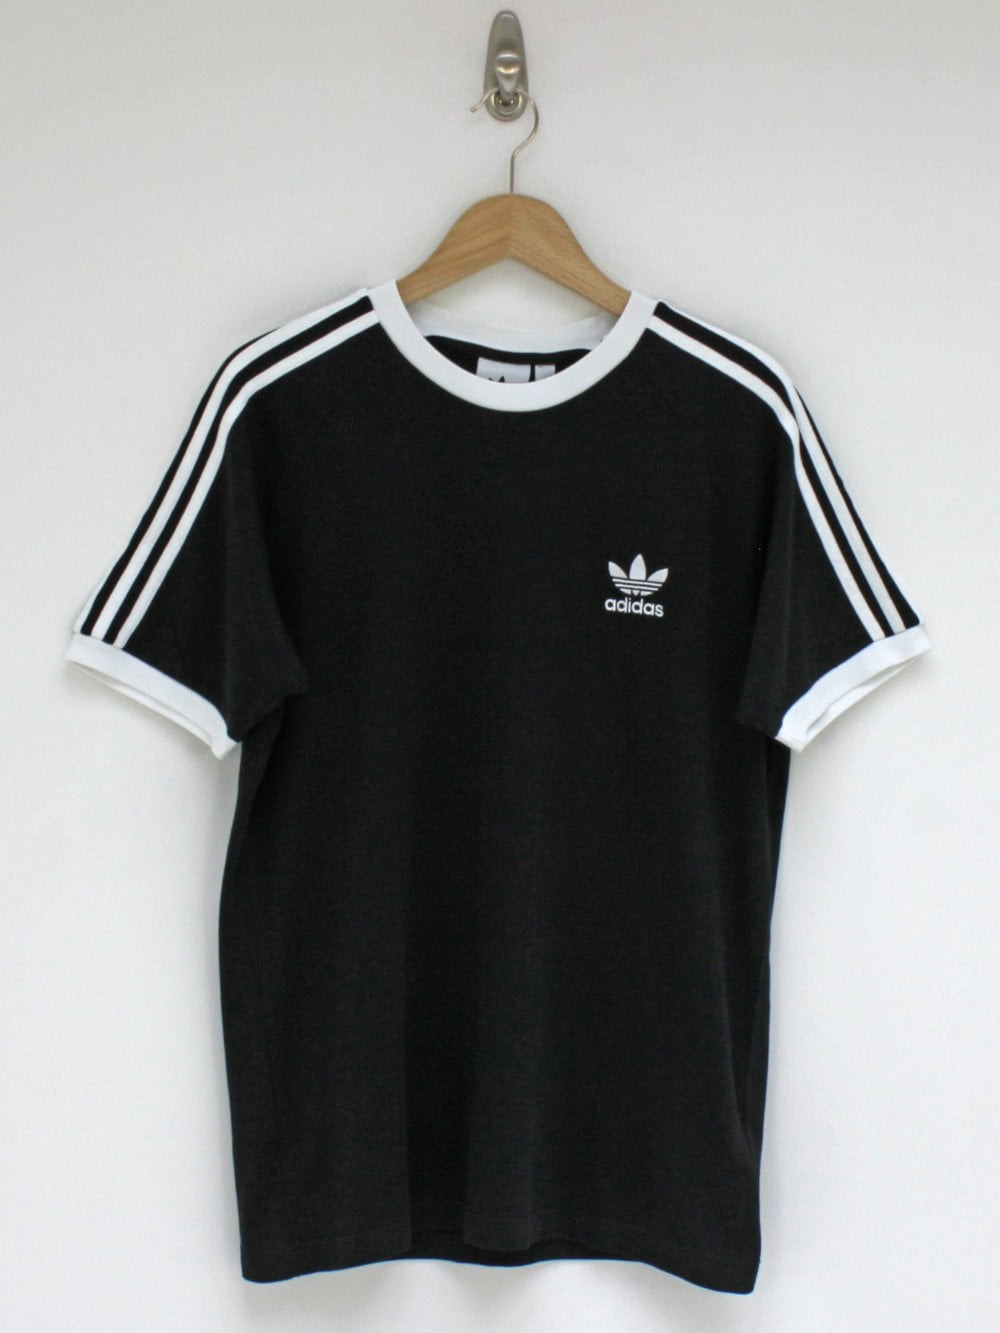 Adidas 3 Stripe Tshirt In Black  Northern Threads